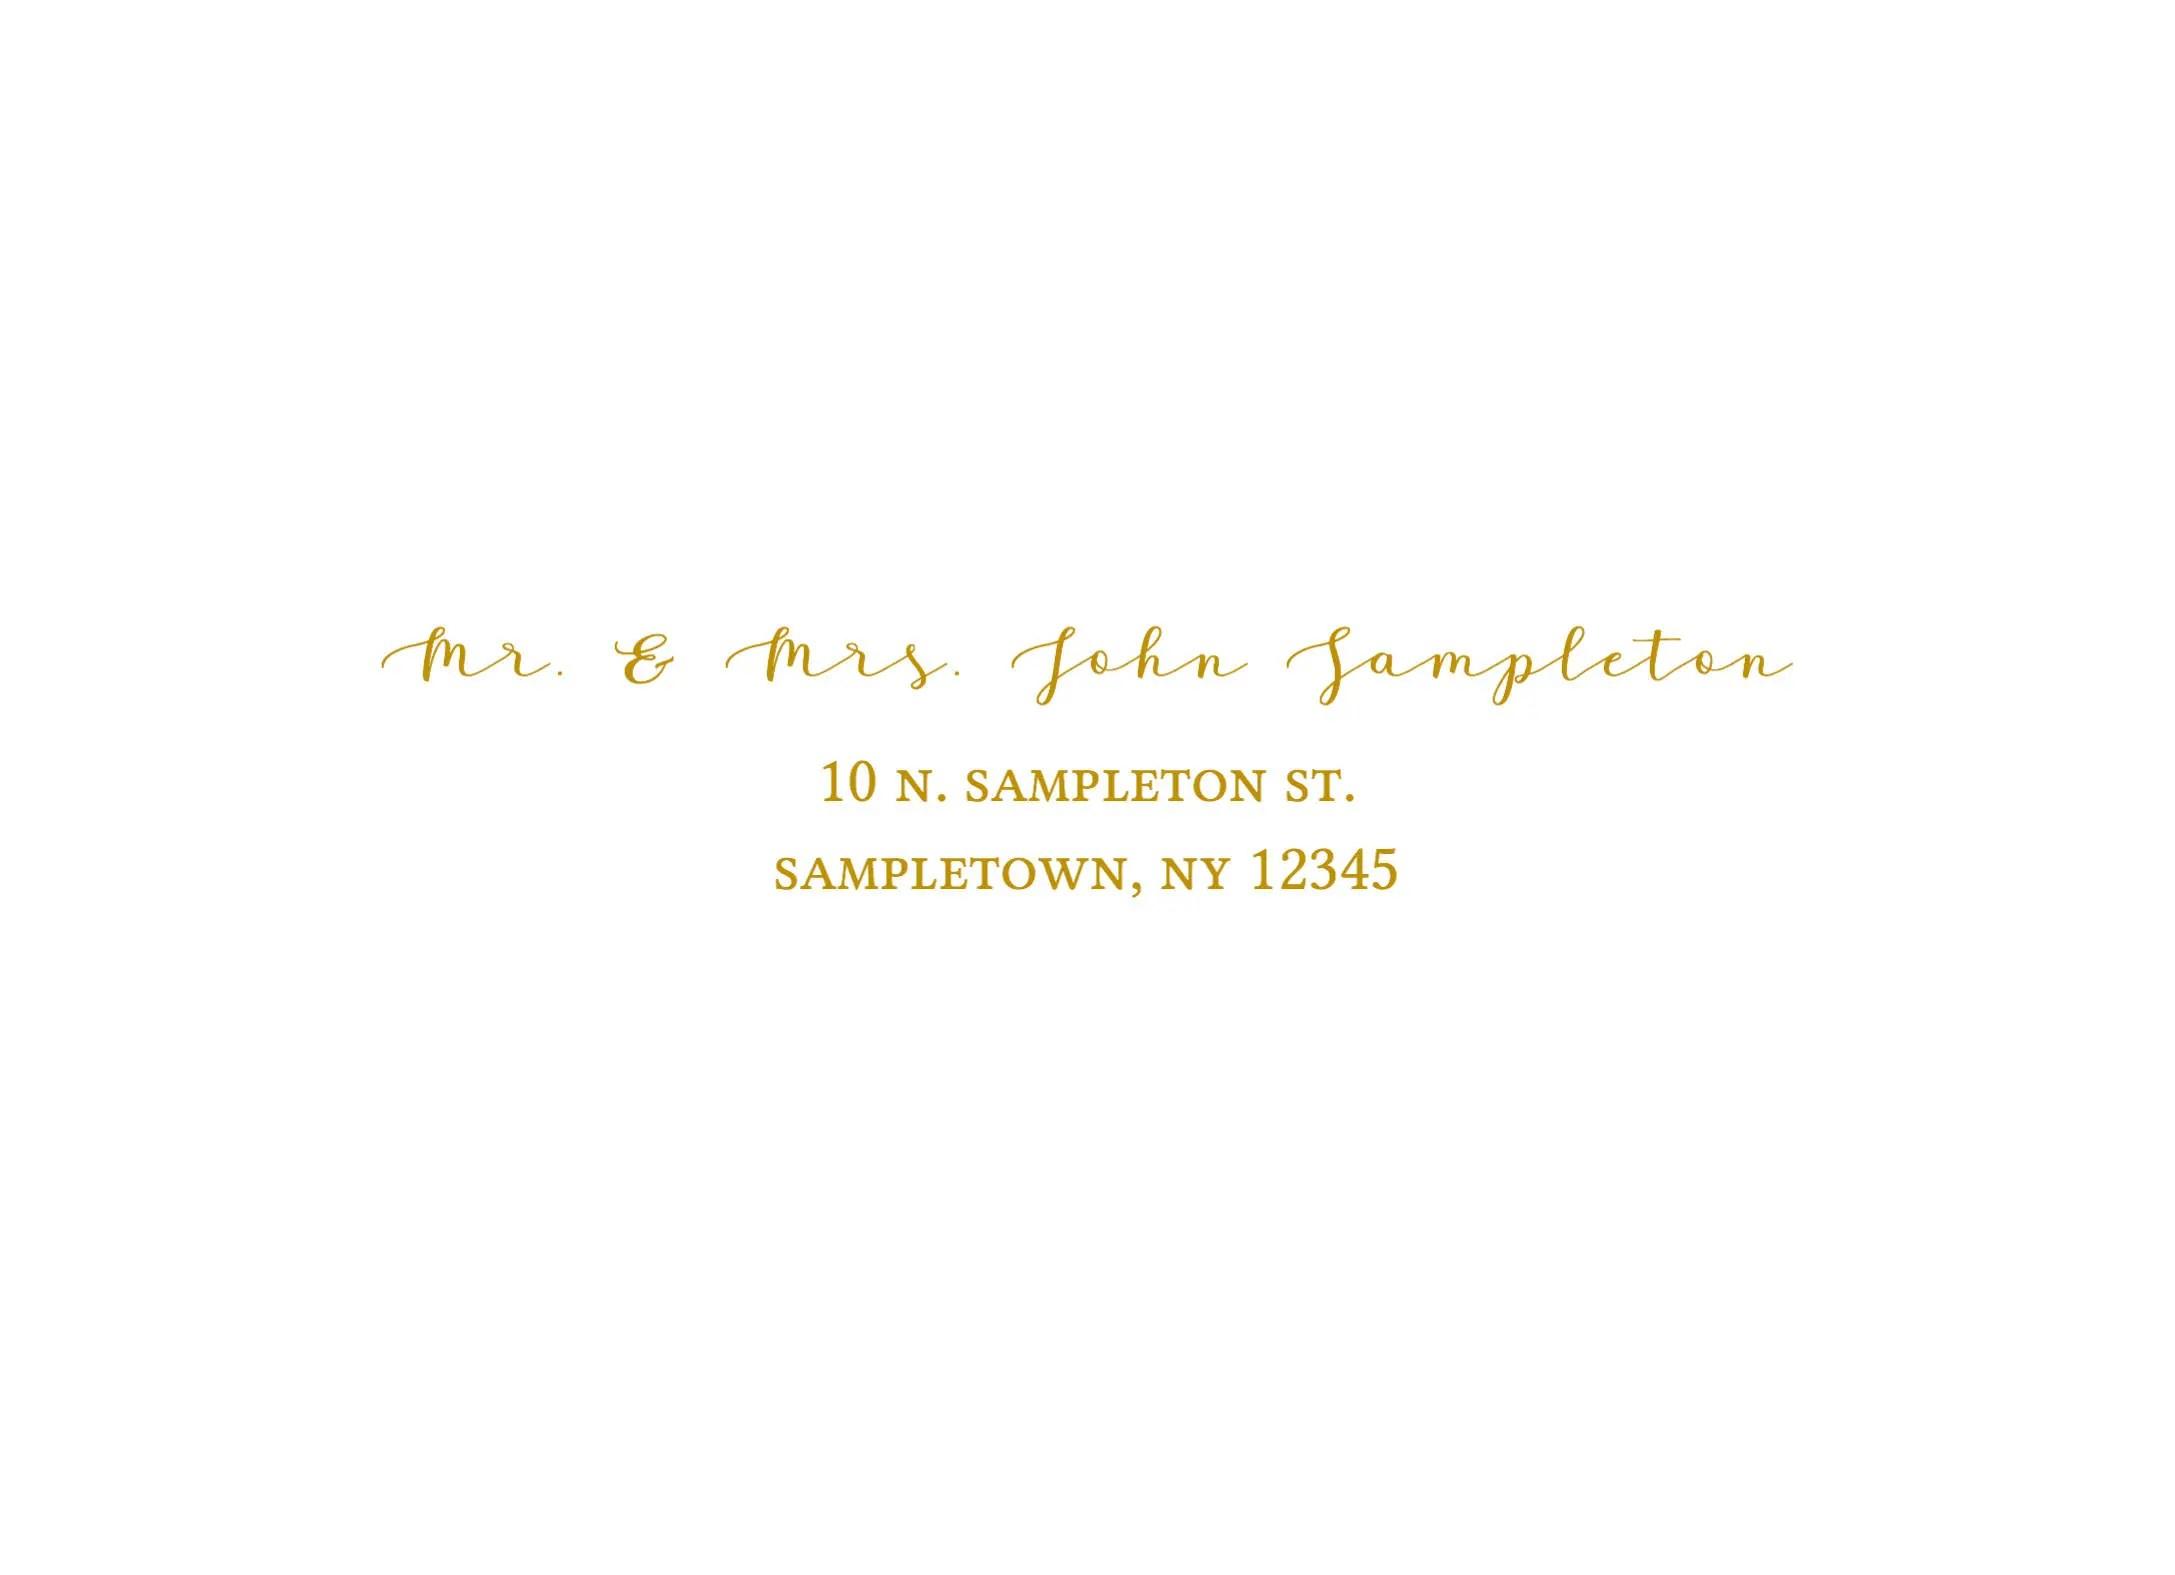 A7 Address Template Envelope Area